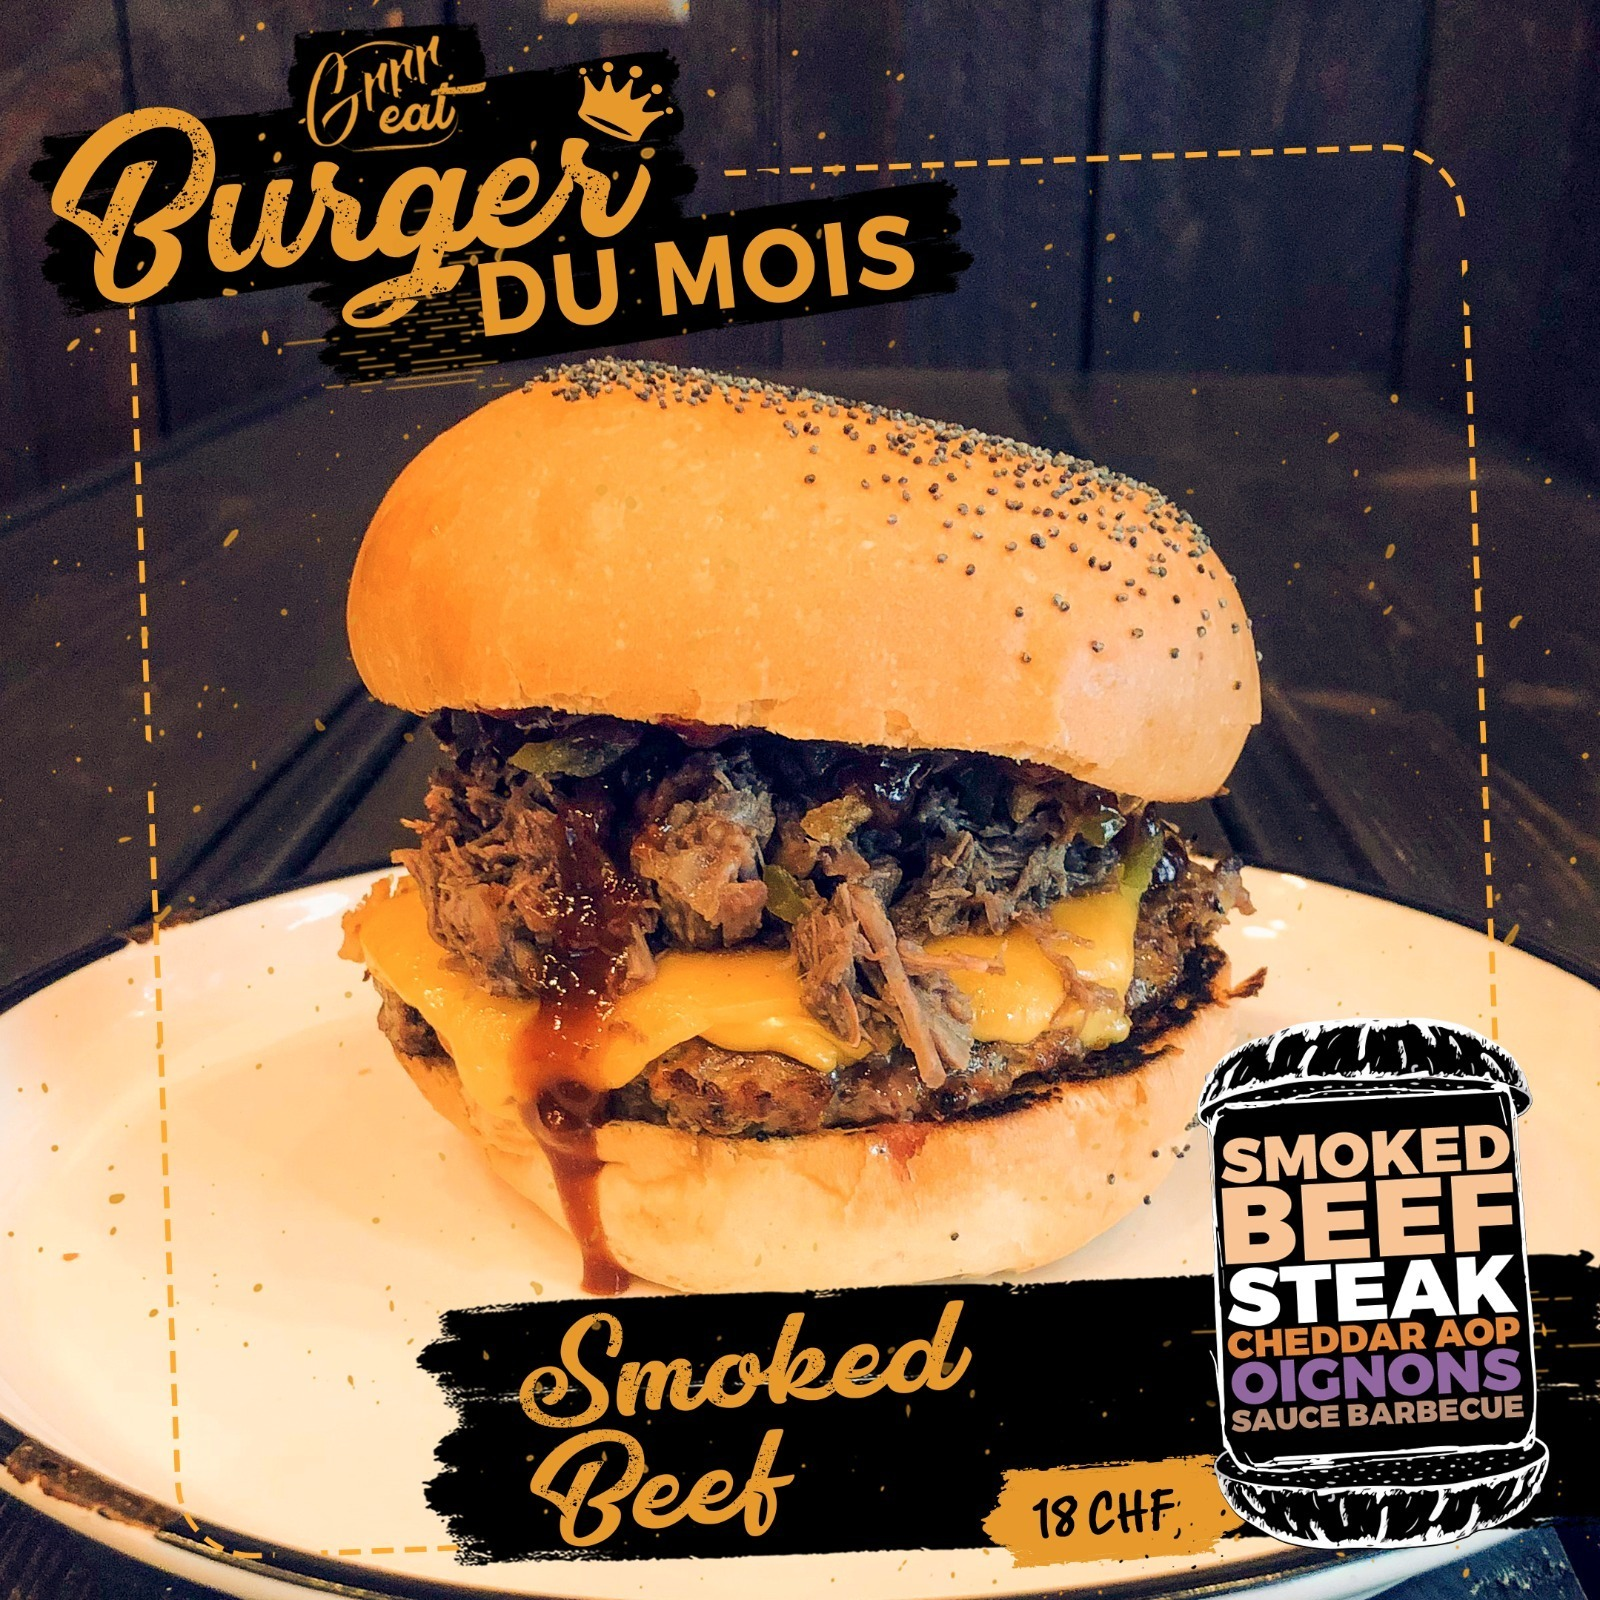 Smoked beef burger